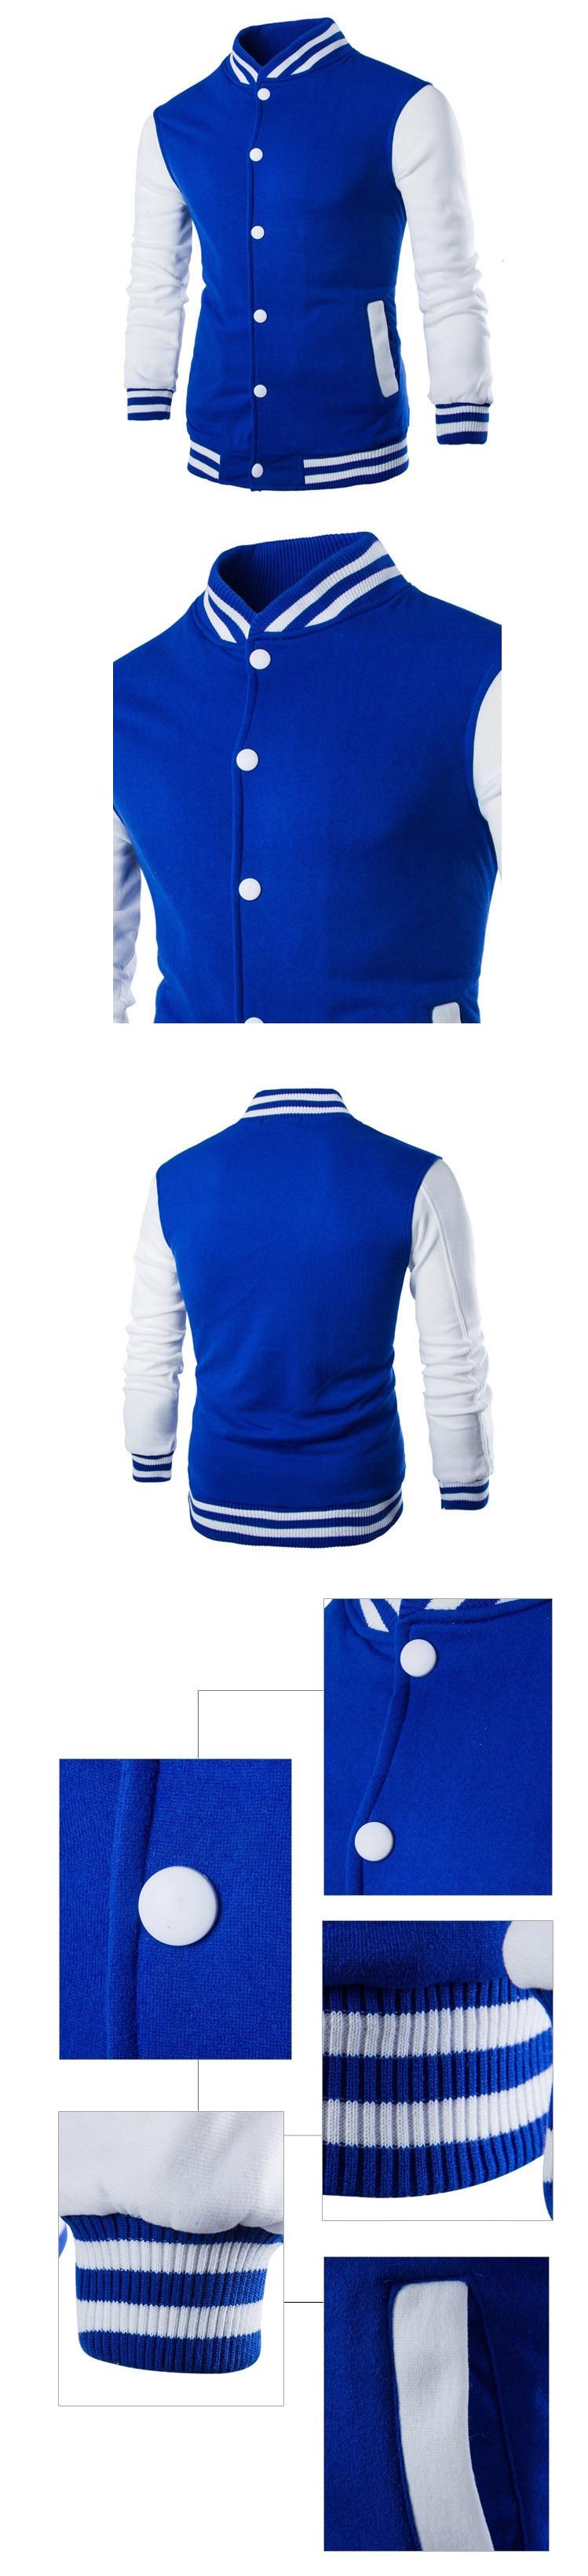 HTB1JndFazzuK1RjSspeq6ziHVXa1 New Men/Boy Baseball Jacket Men 2019 Fashion Design Wine Red Mens Slim Fit College Varsity Jacket Men Brand Stylish Veste Homme